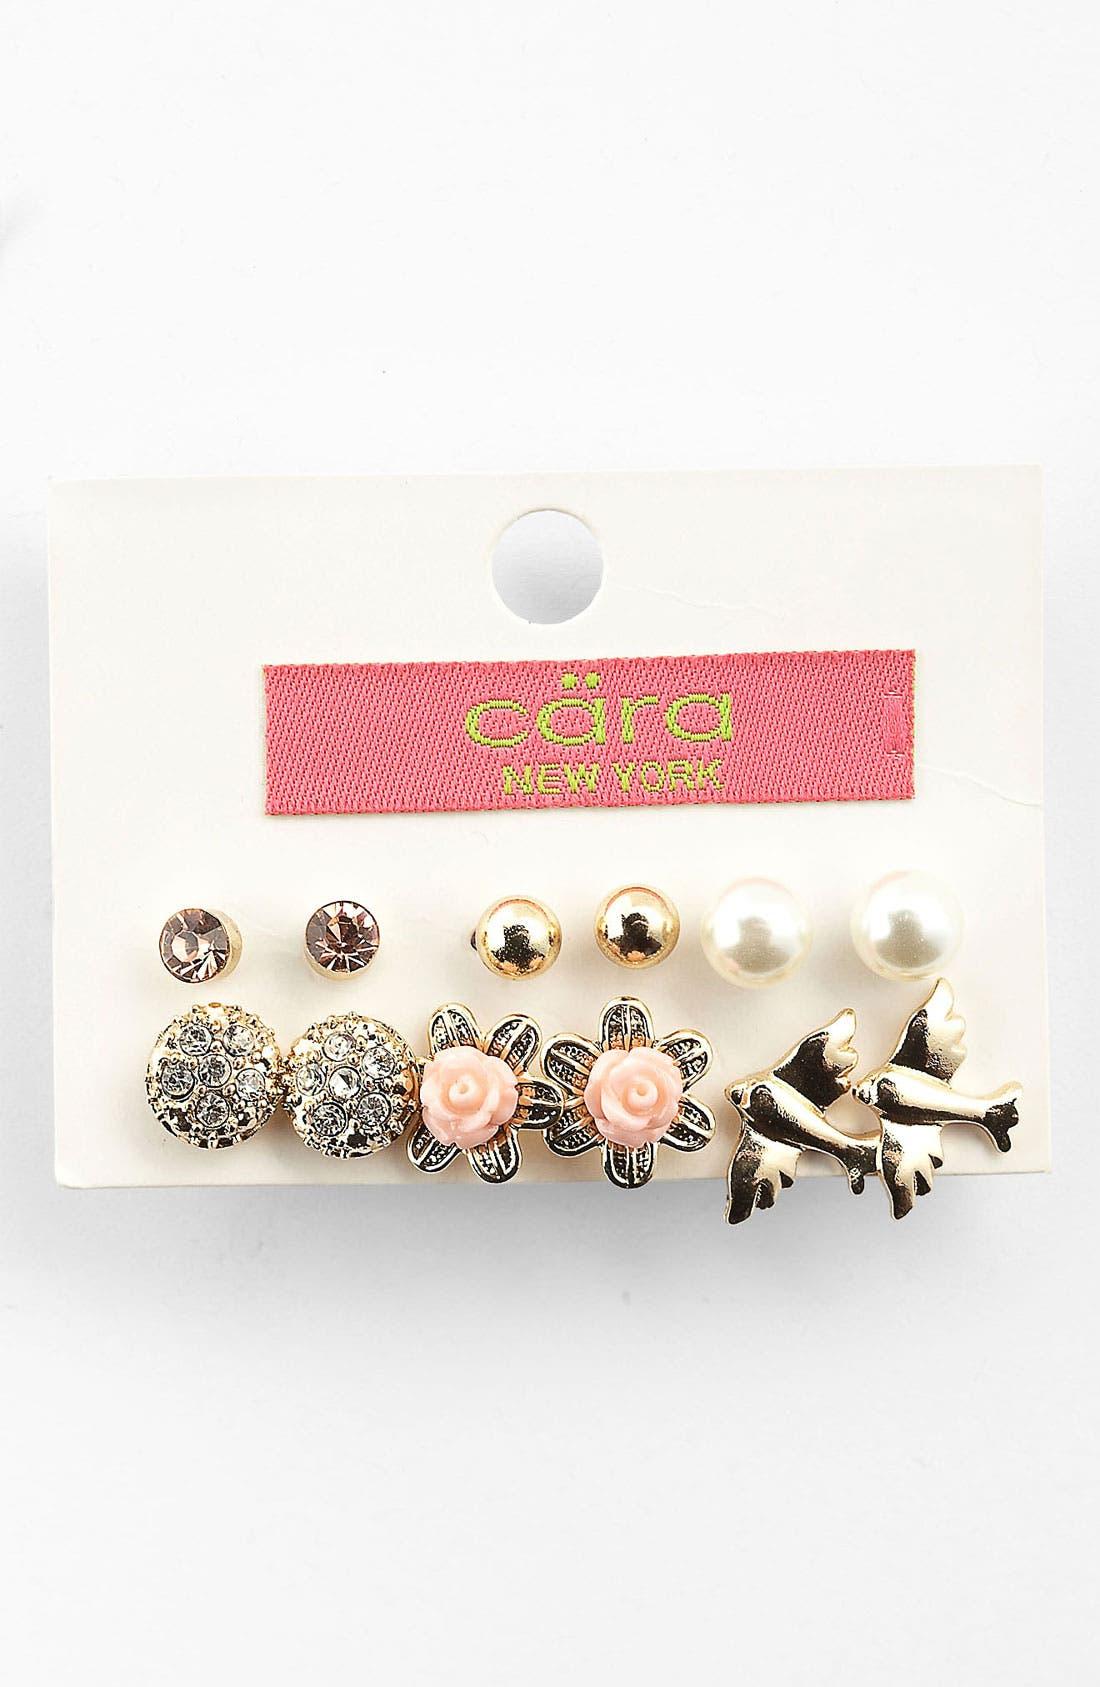 Main Image - Cara Assorted Earrings (Set of 6)